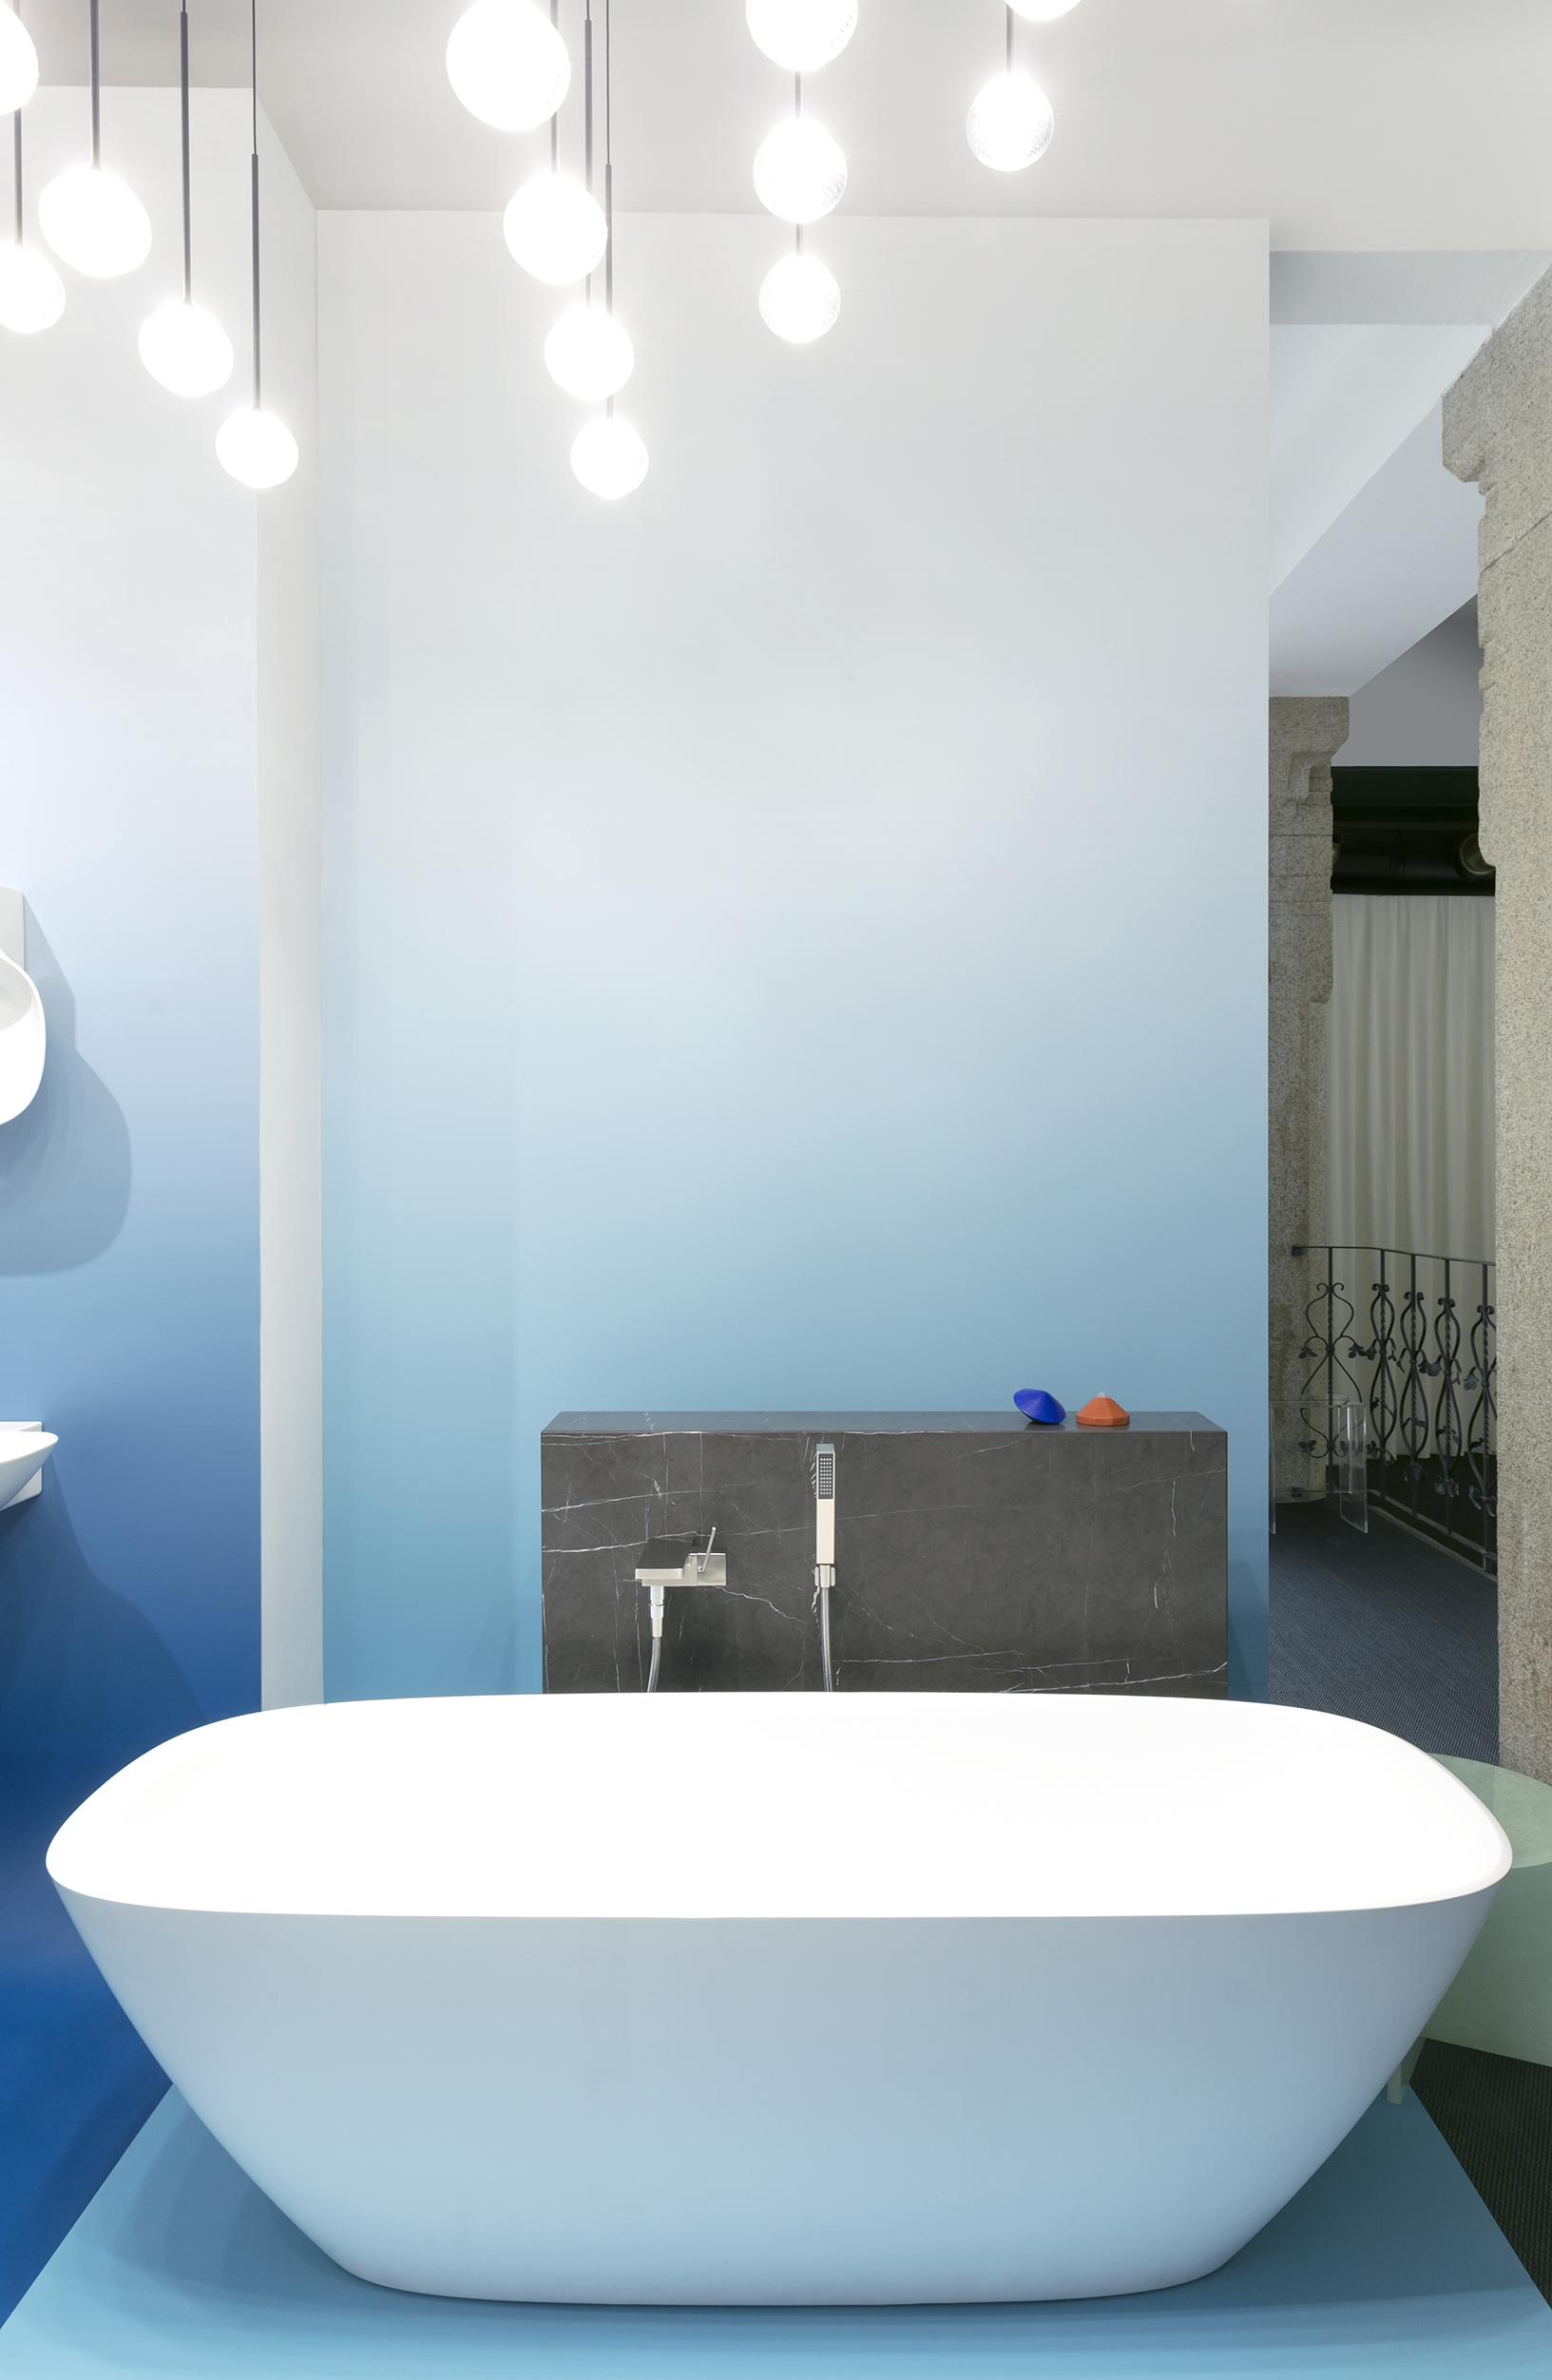 laufen-ino-exhibition-02